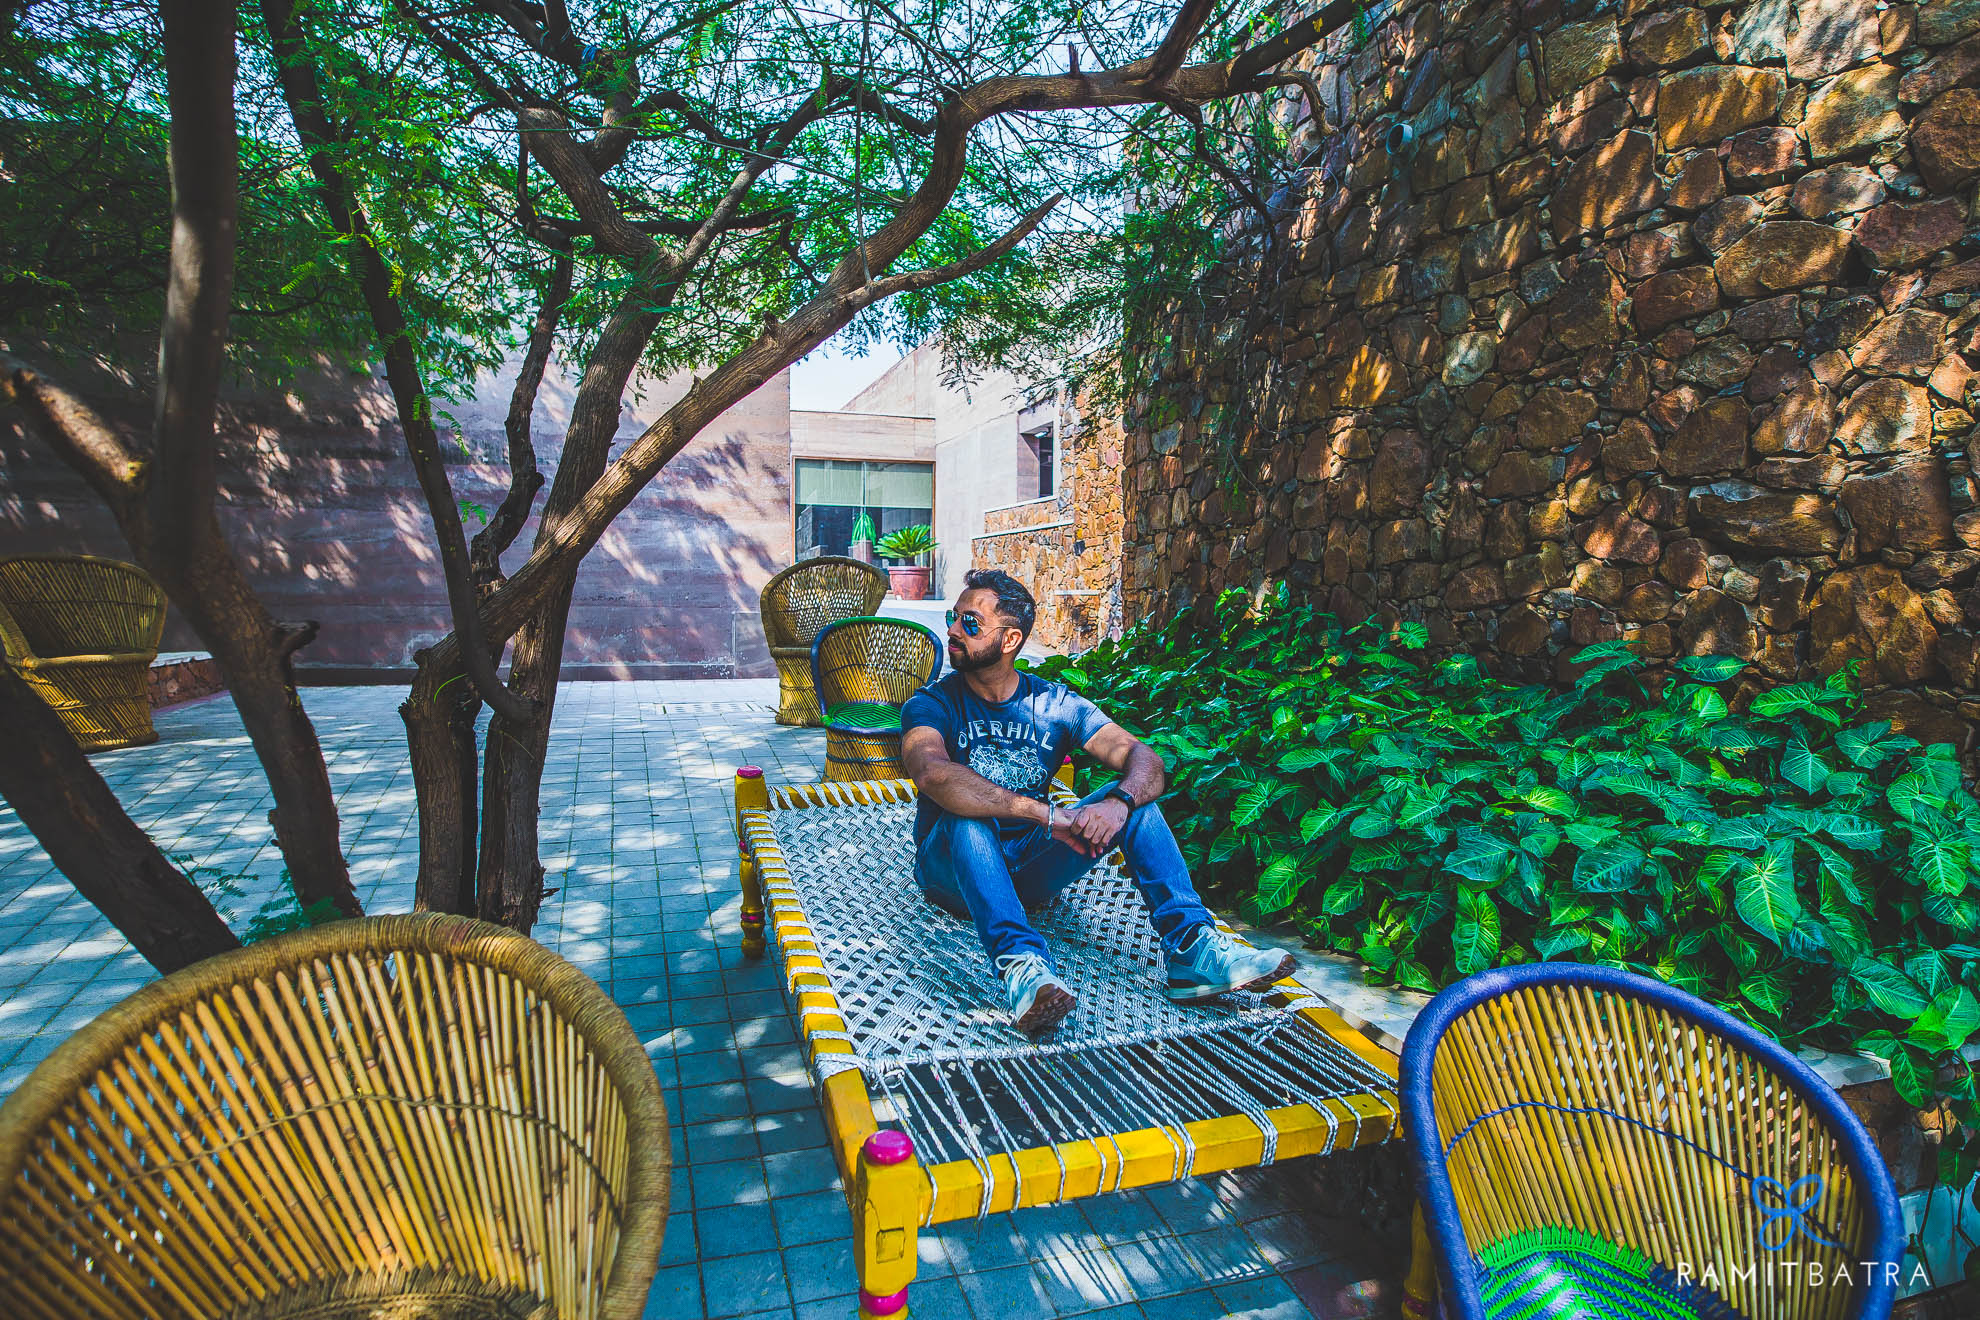 lalit-mangar-hotel-near-delhi-ramitbatra-012